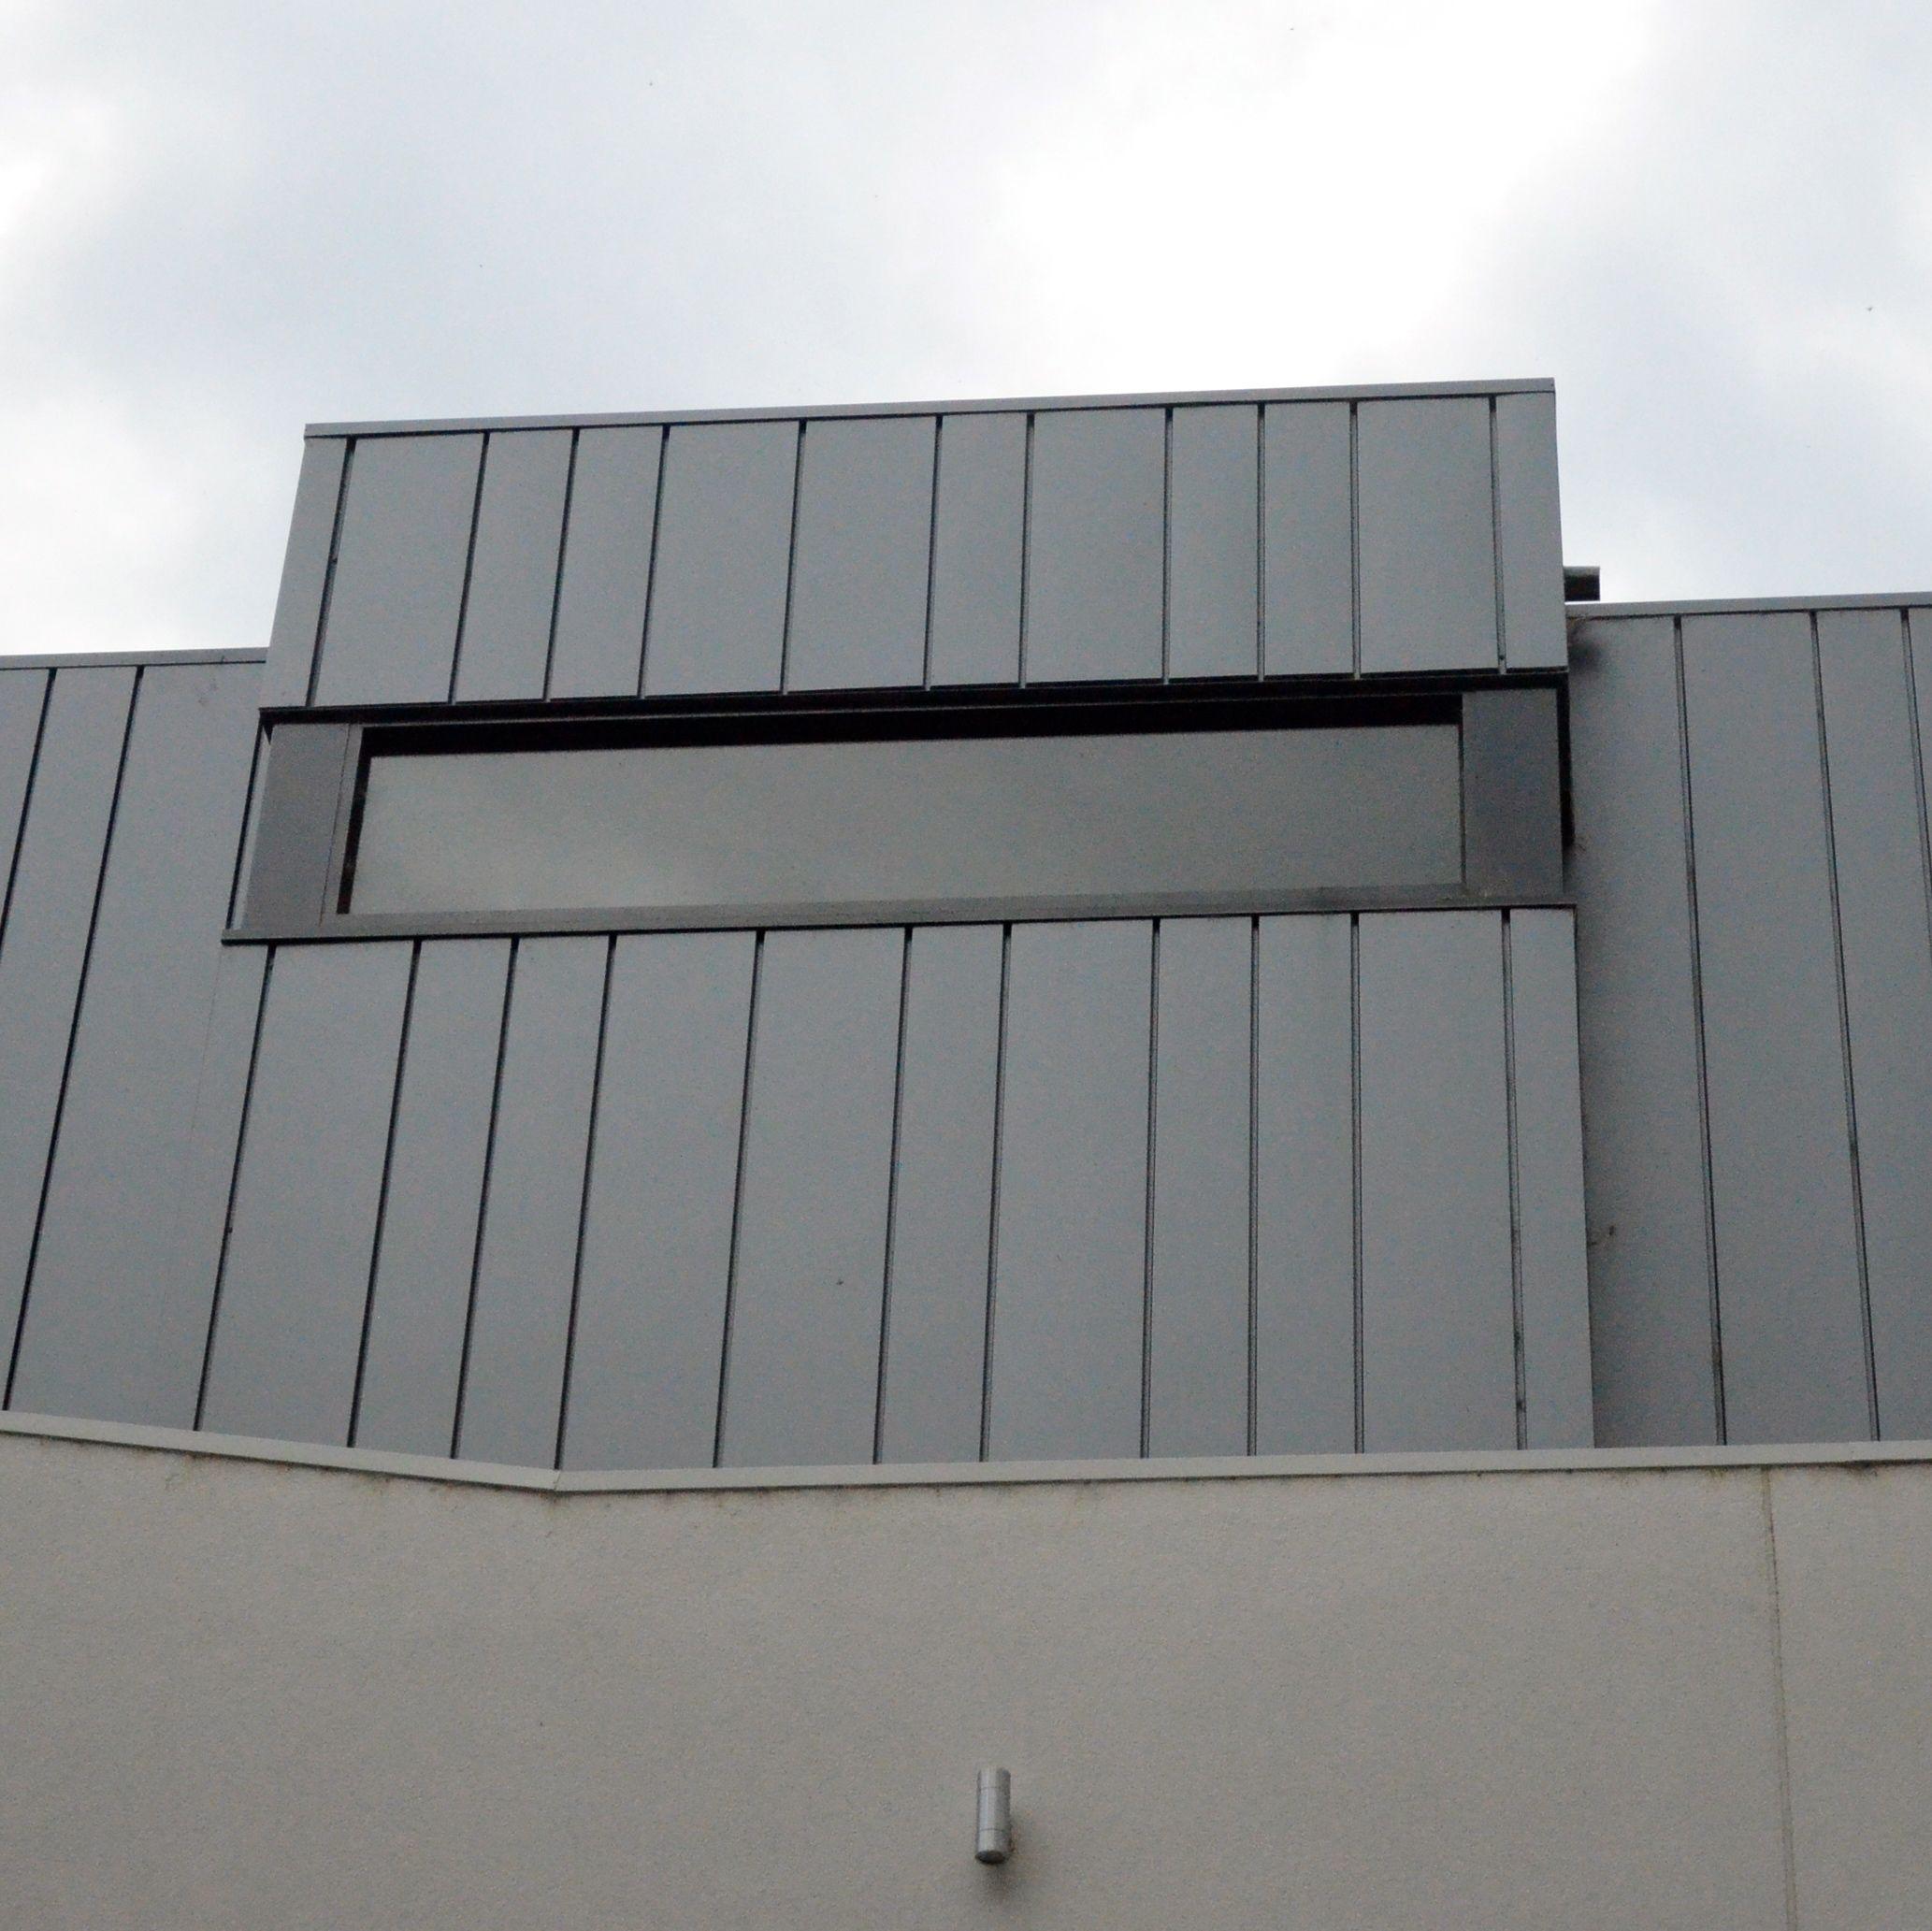 Wall Cladding Plastic Shower Panels 1000mm Wide Pvc Wet Wall Panels 1m X 2 4m Bathroom Cladding